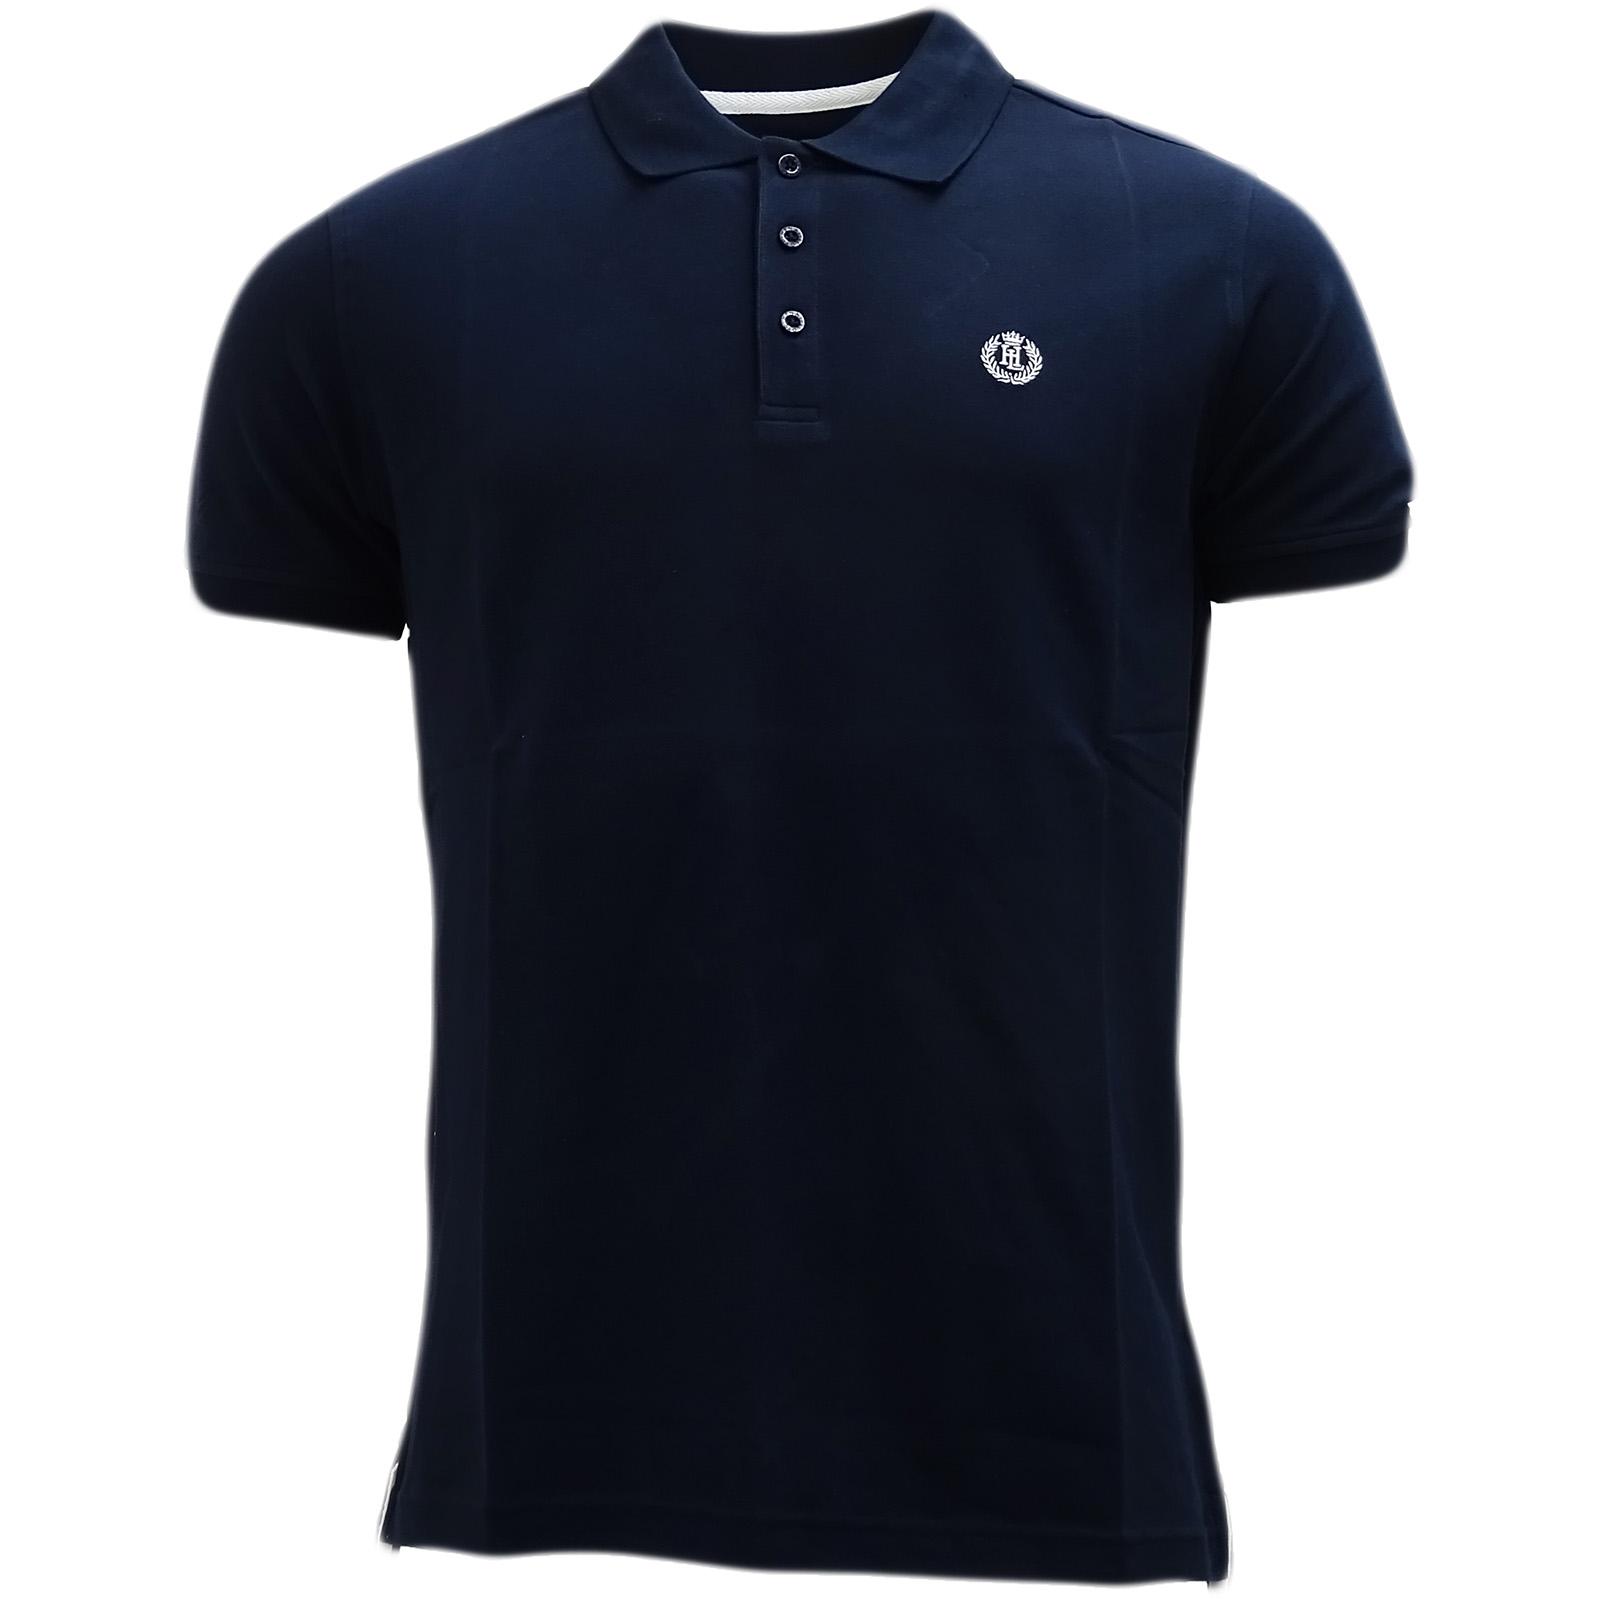 Henri-Lloyd-Plain-Polo-Shirt-Smart-Casual-Polos